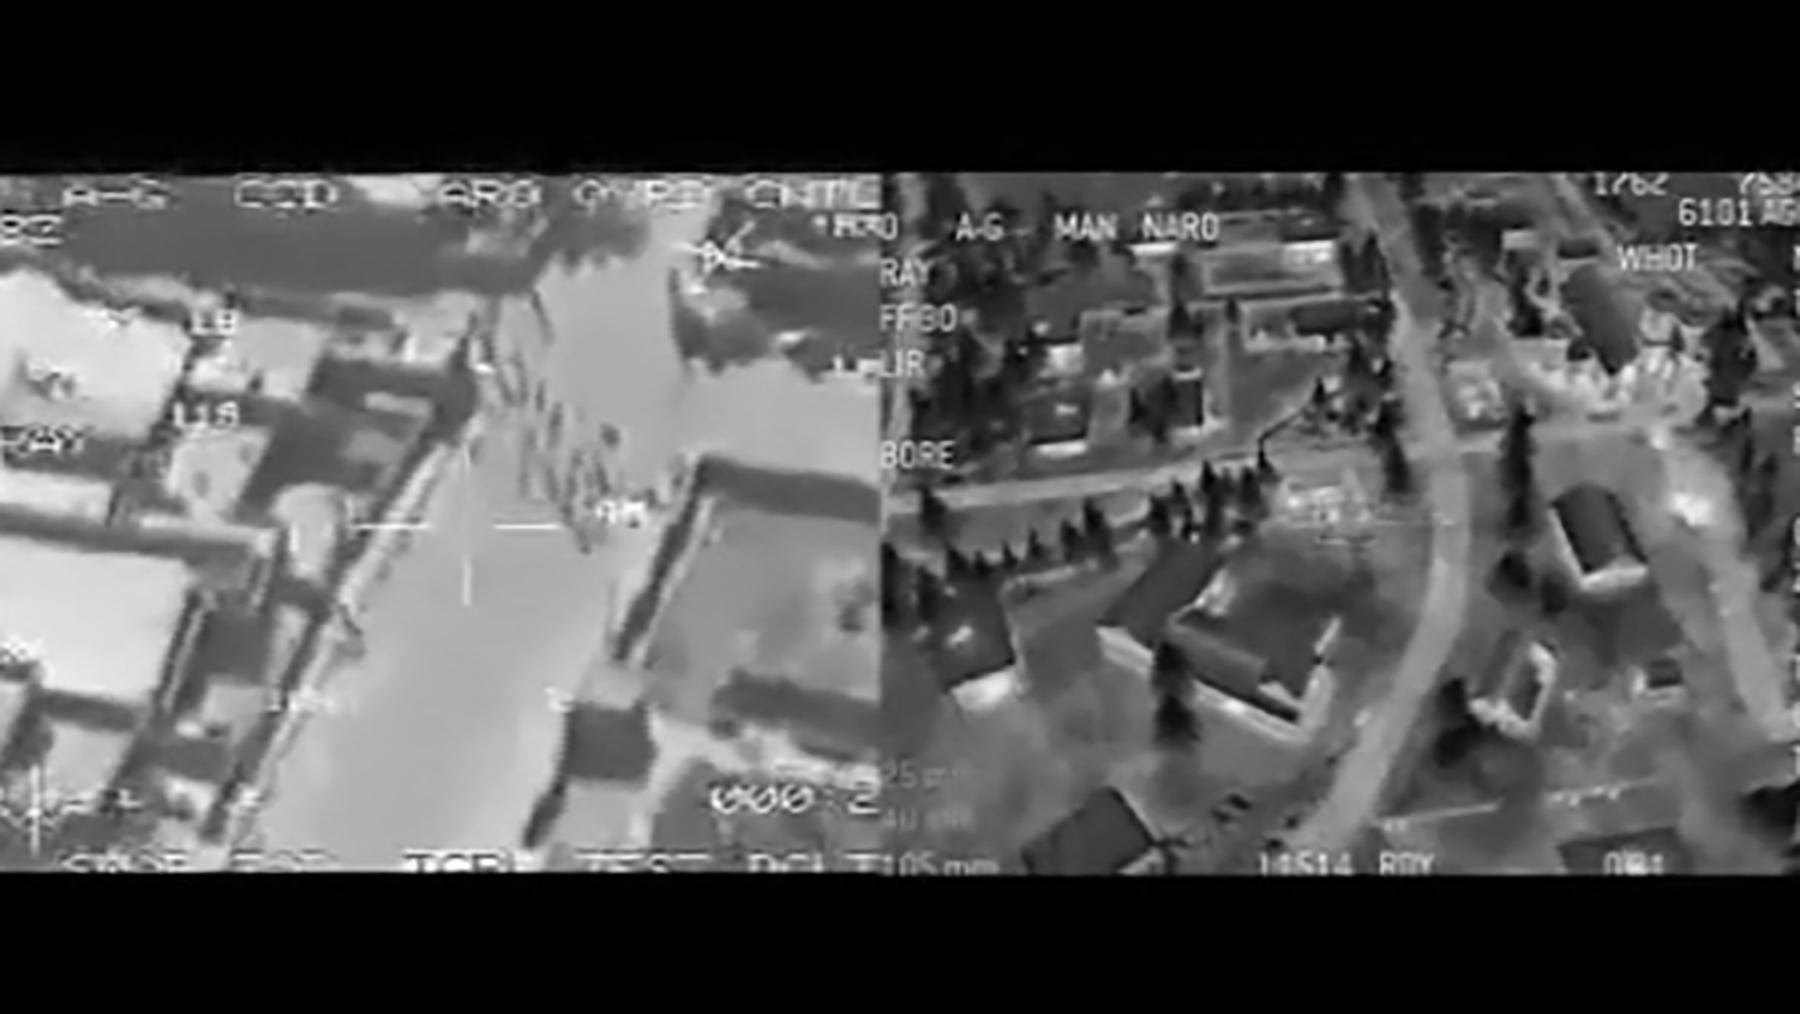 Post Newtonianism (War Footage_Call of Duty 4 Modern warfare footage)_Video_Josh Bricker.jpg